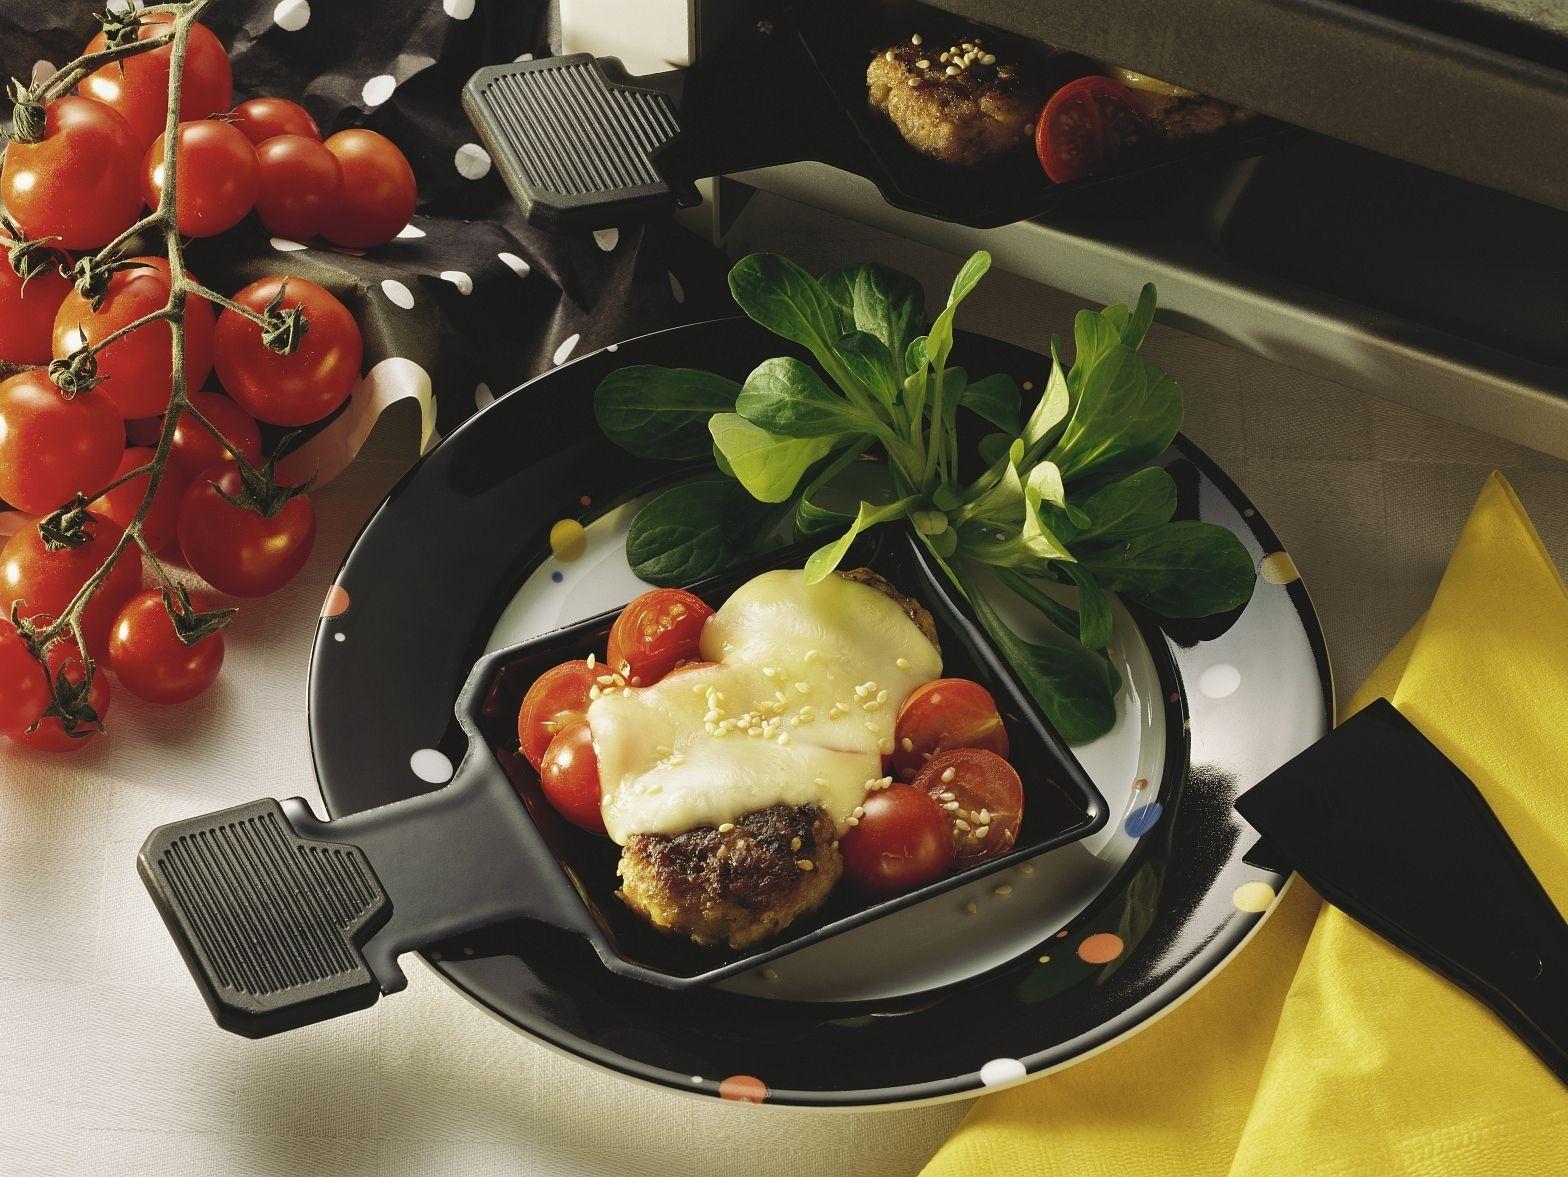 rezepte raclette fisch beliebte gerichte und rezepte. Black Bedroom Furniture Sets. Home Design Ideas